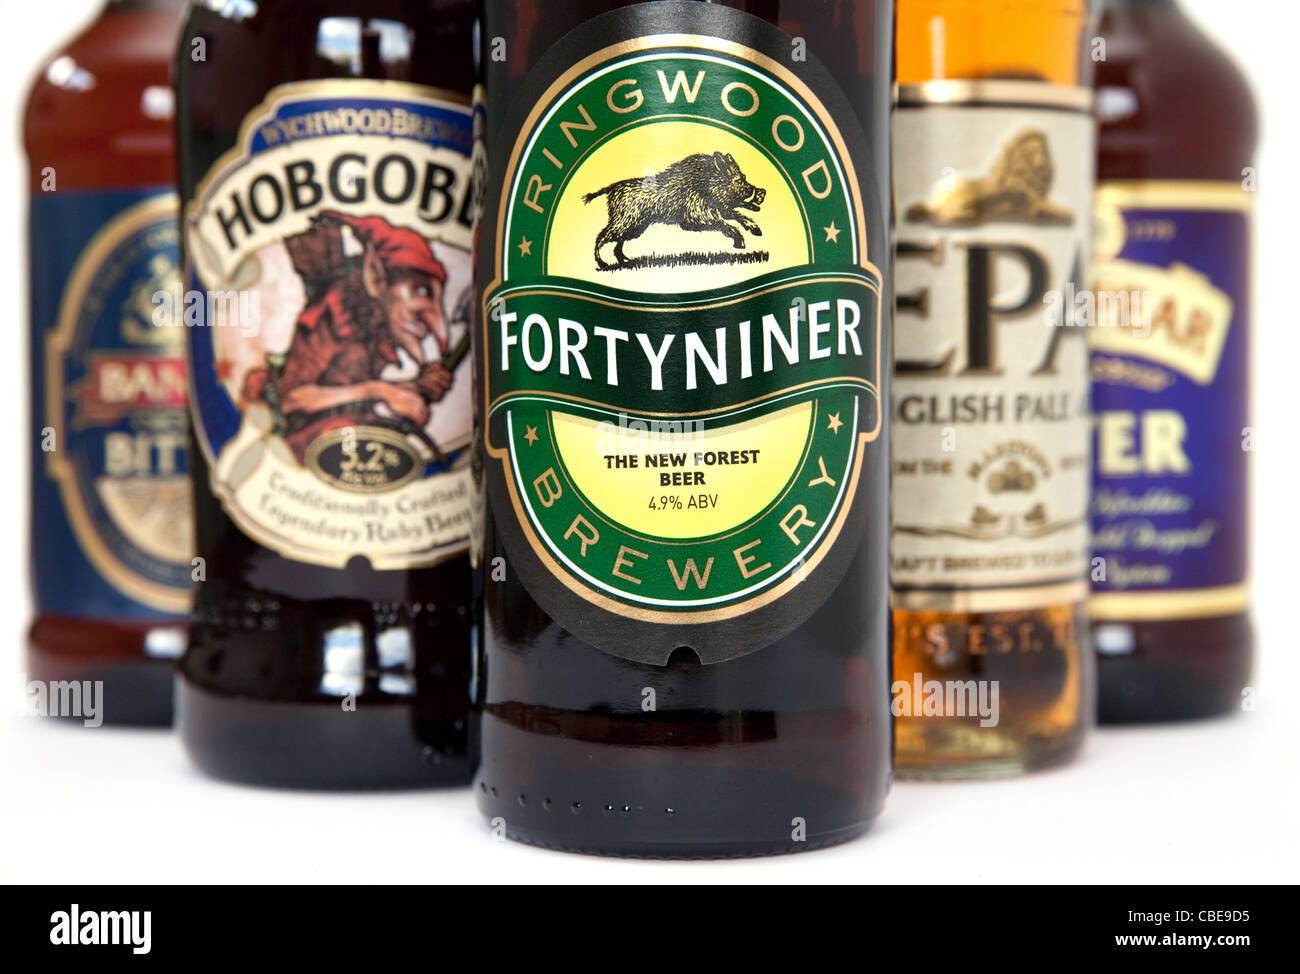 British bottled beers - Stock Image